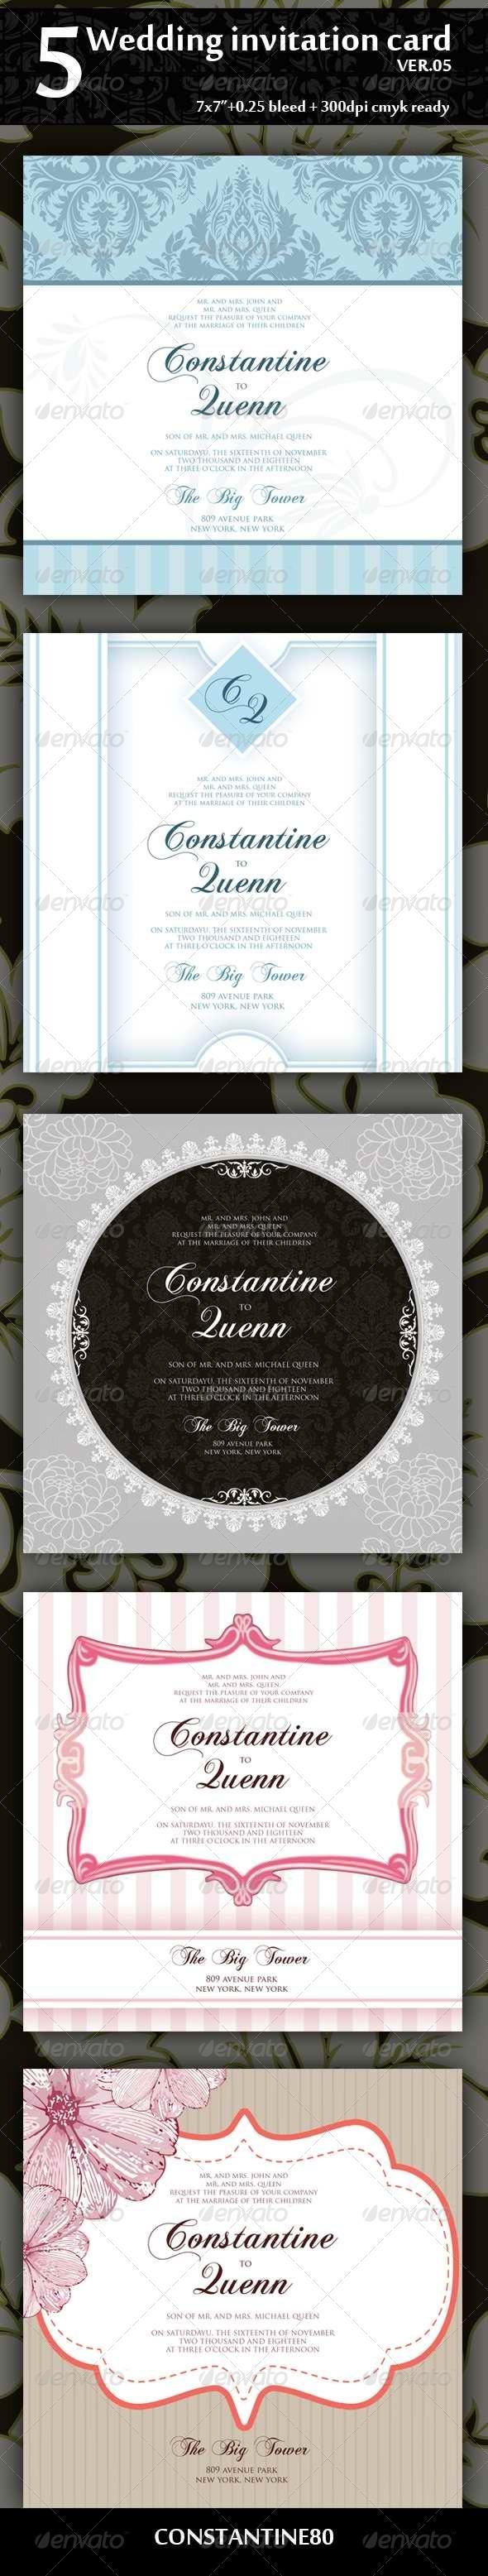 5 Wedding Invitation Card Ver05 - Weddings Cards & Invites